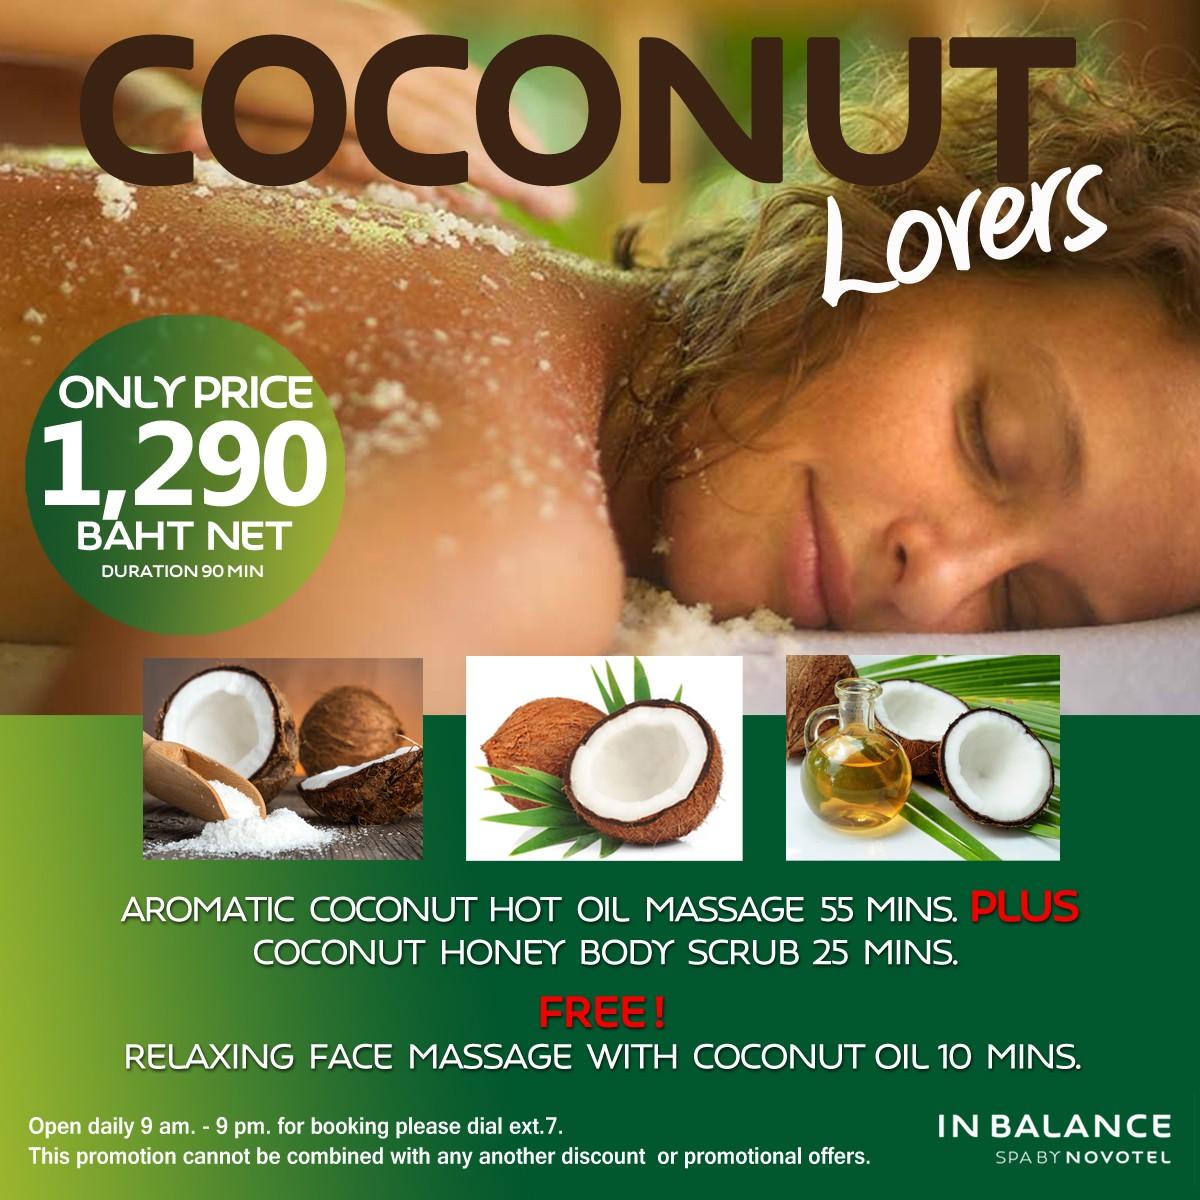 Massage Coconut Lovers